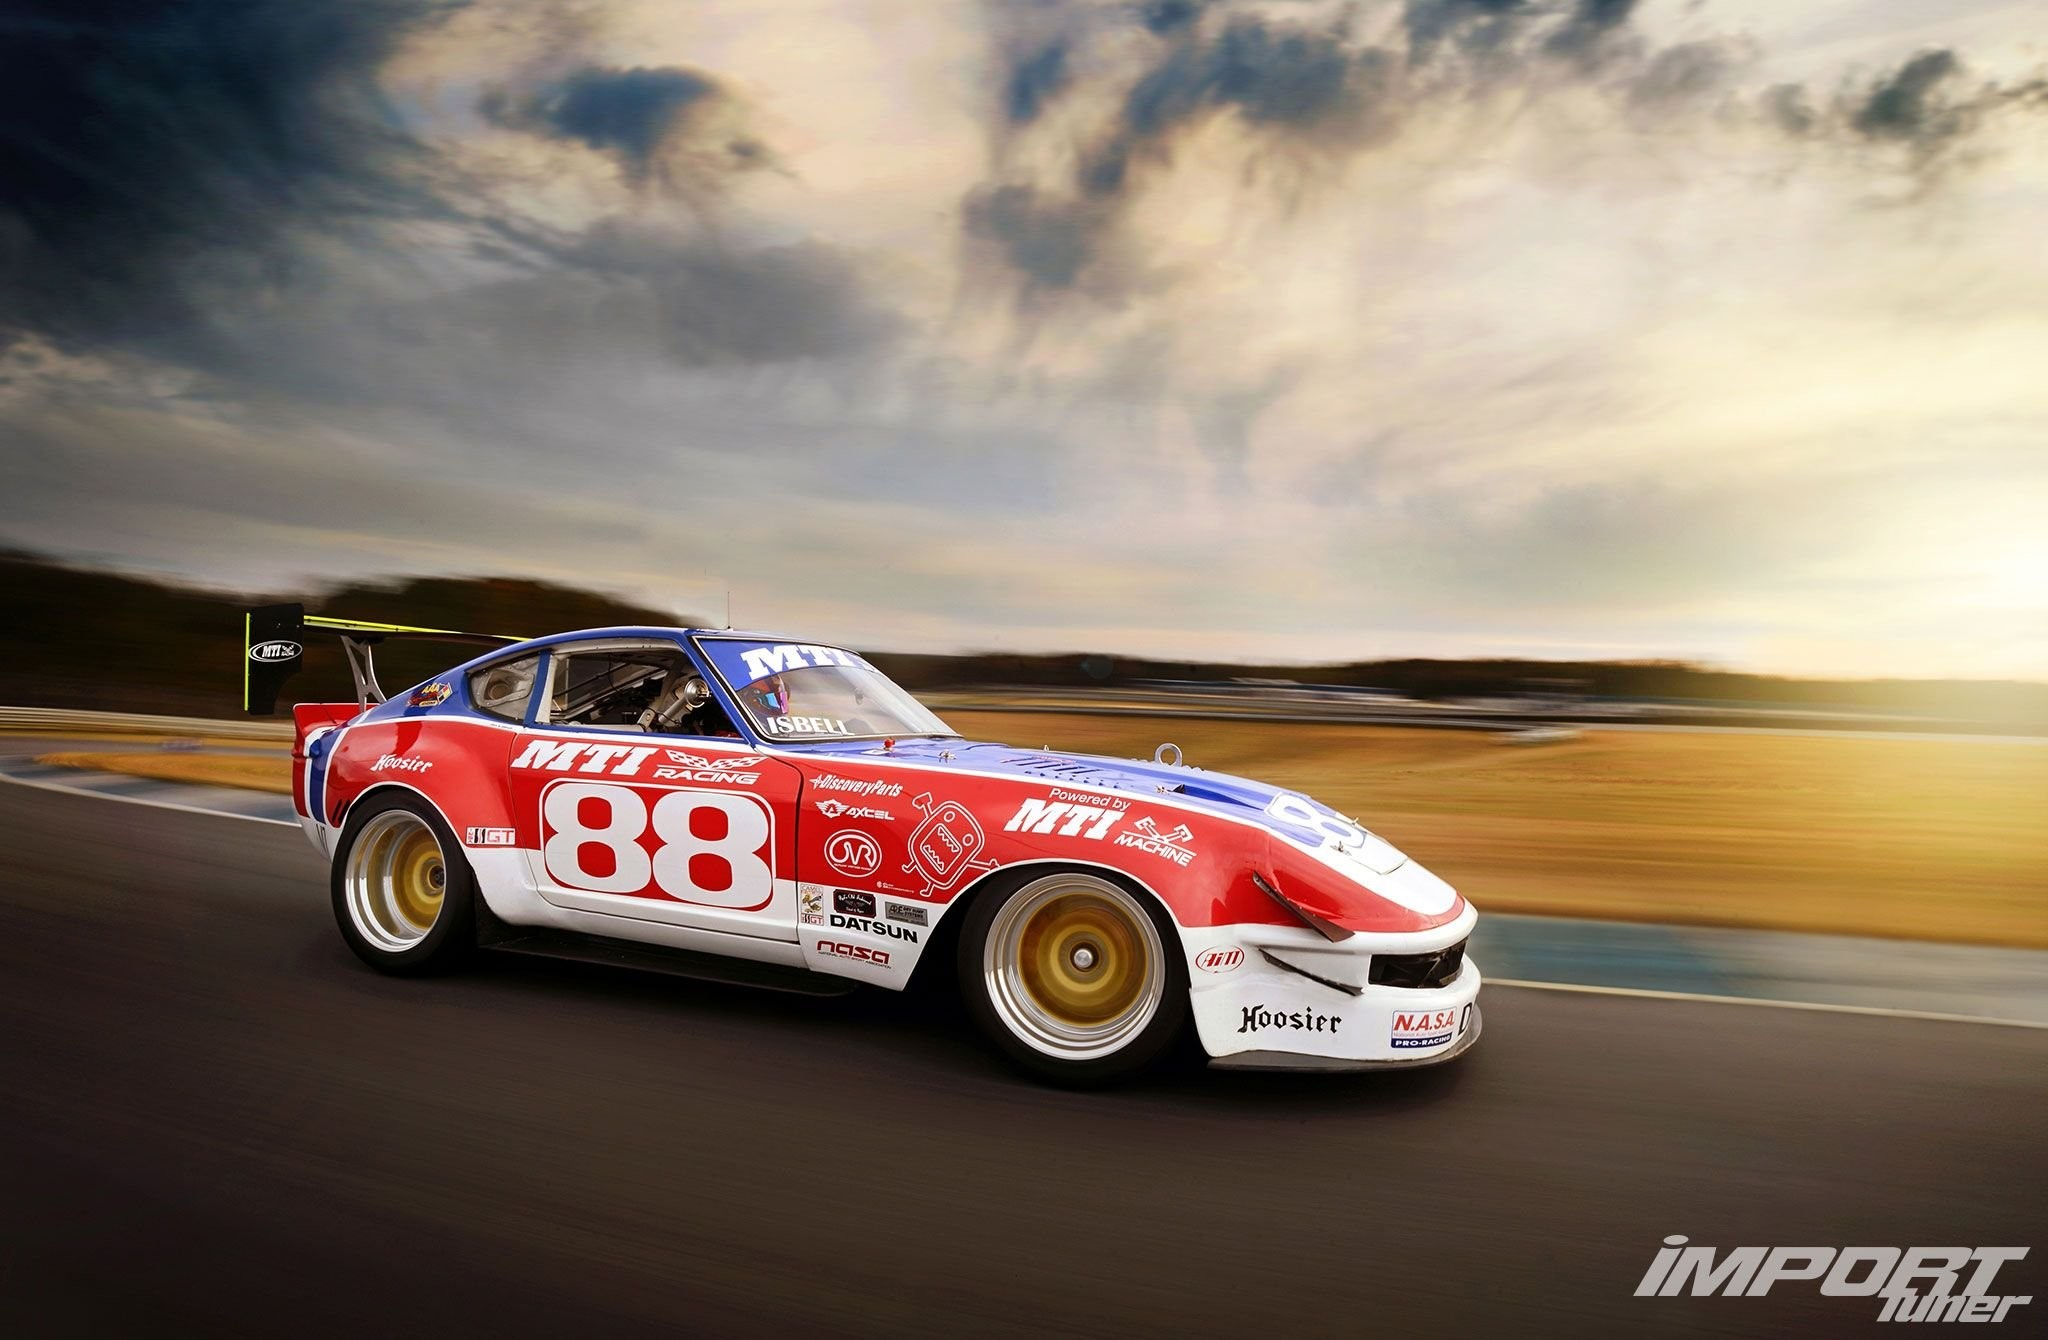 Nissan datsun 240z coupe japan tuning cars fairlady wallpaper | |  502187 | WallpaperUP